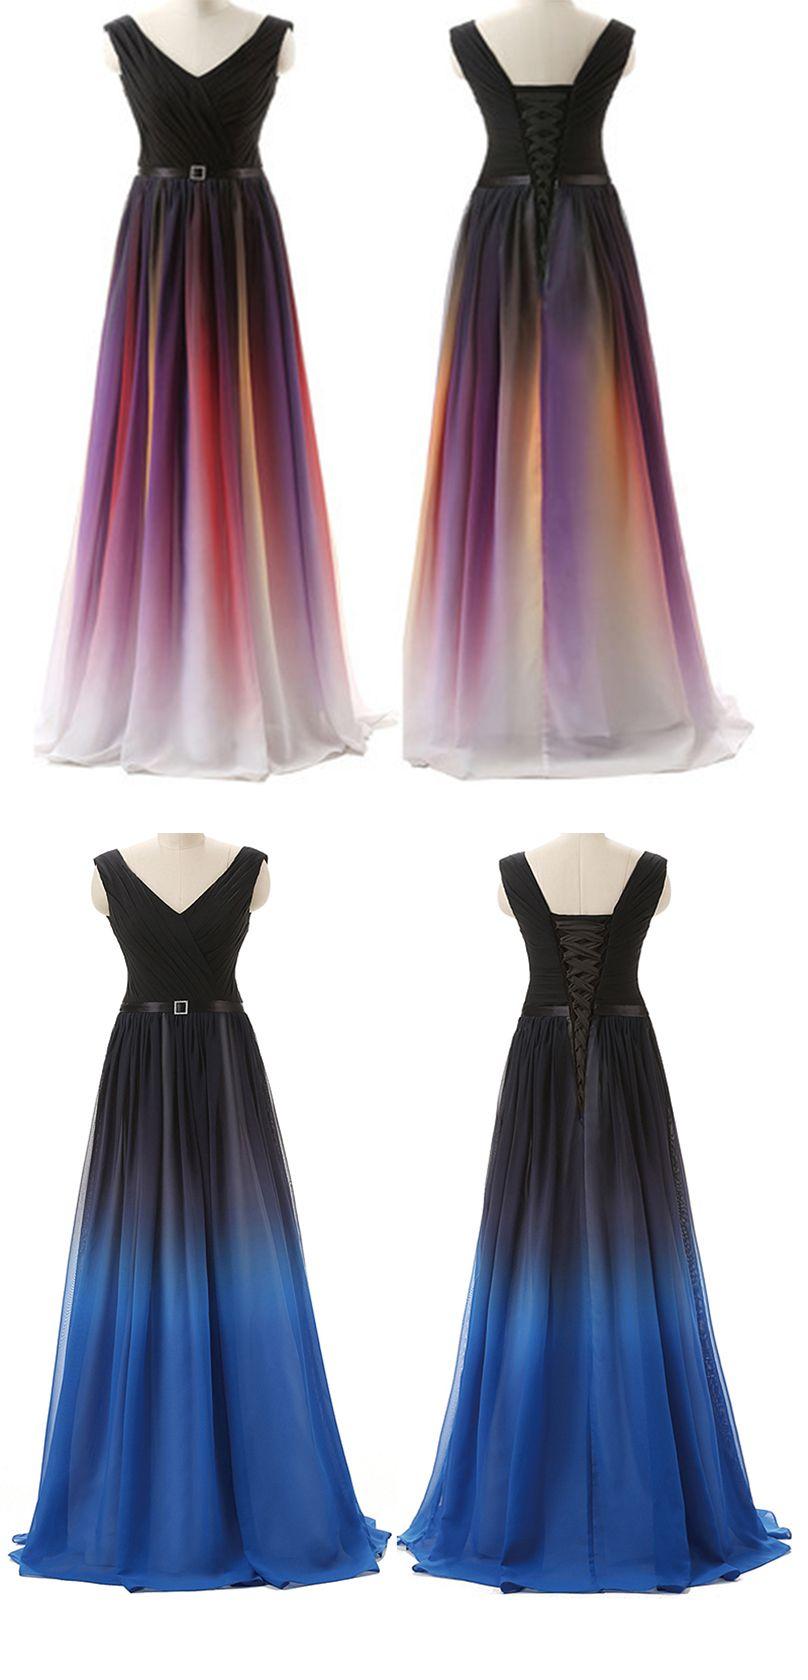 Ombre custom made charming prom dressformal dresseschiffon evening